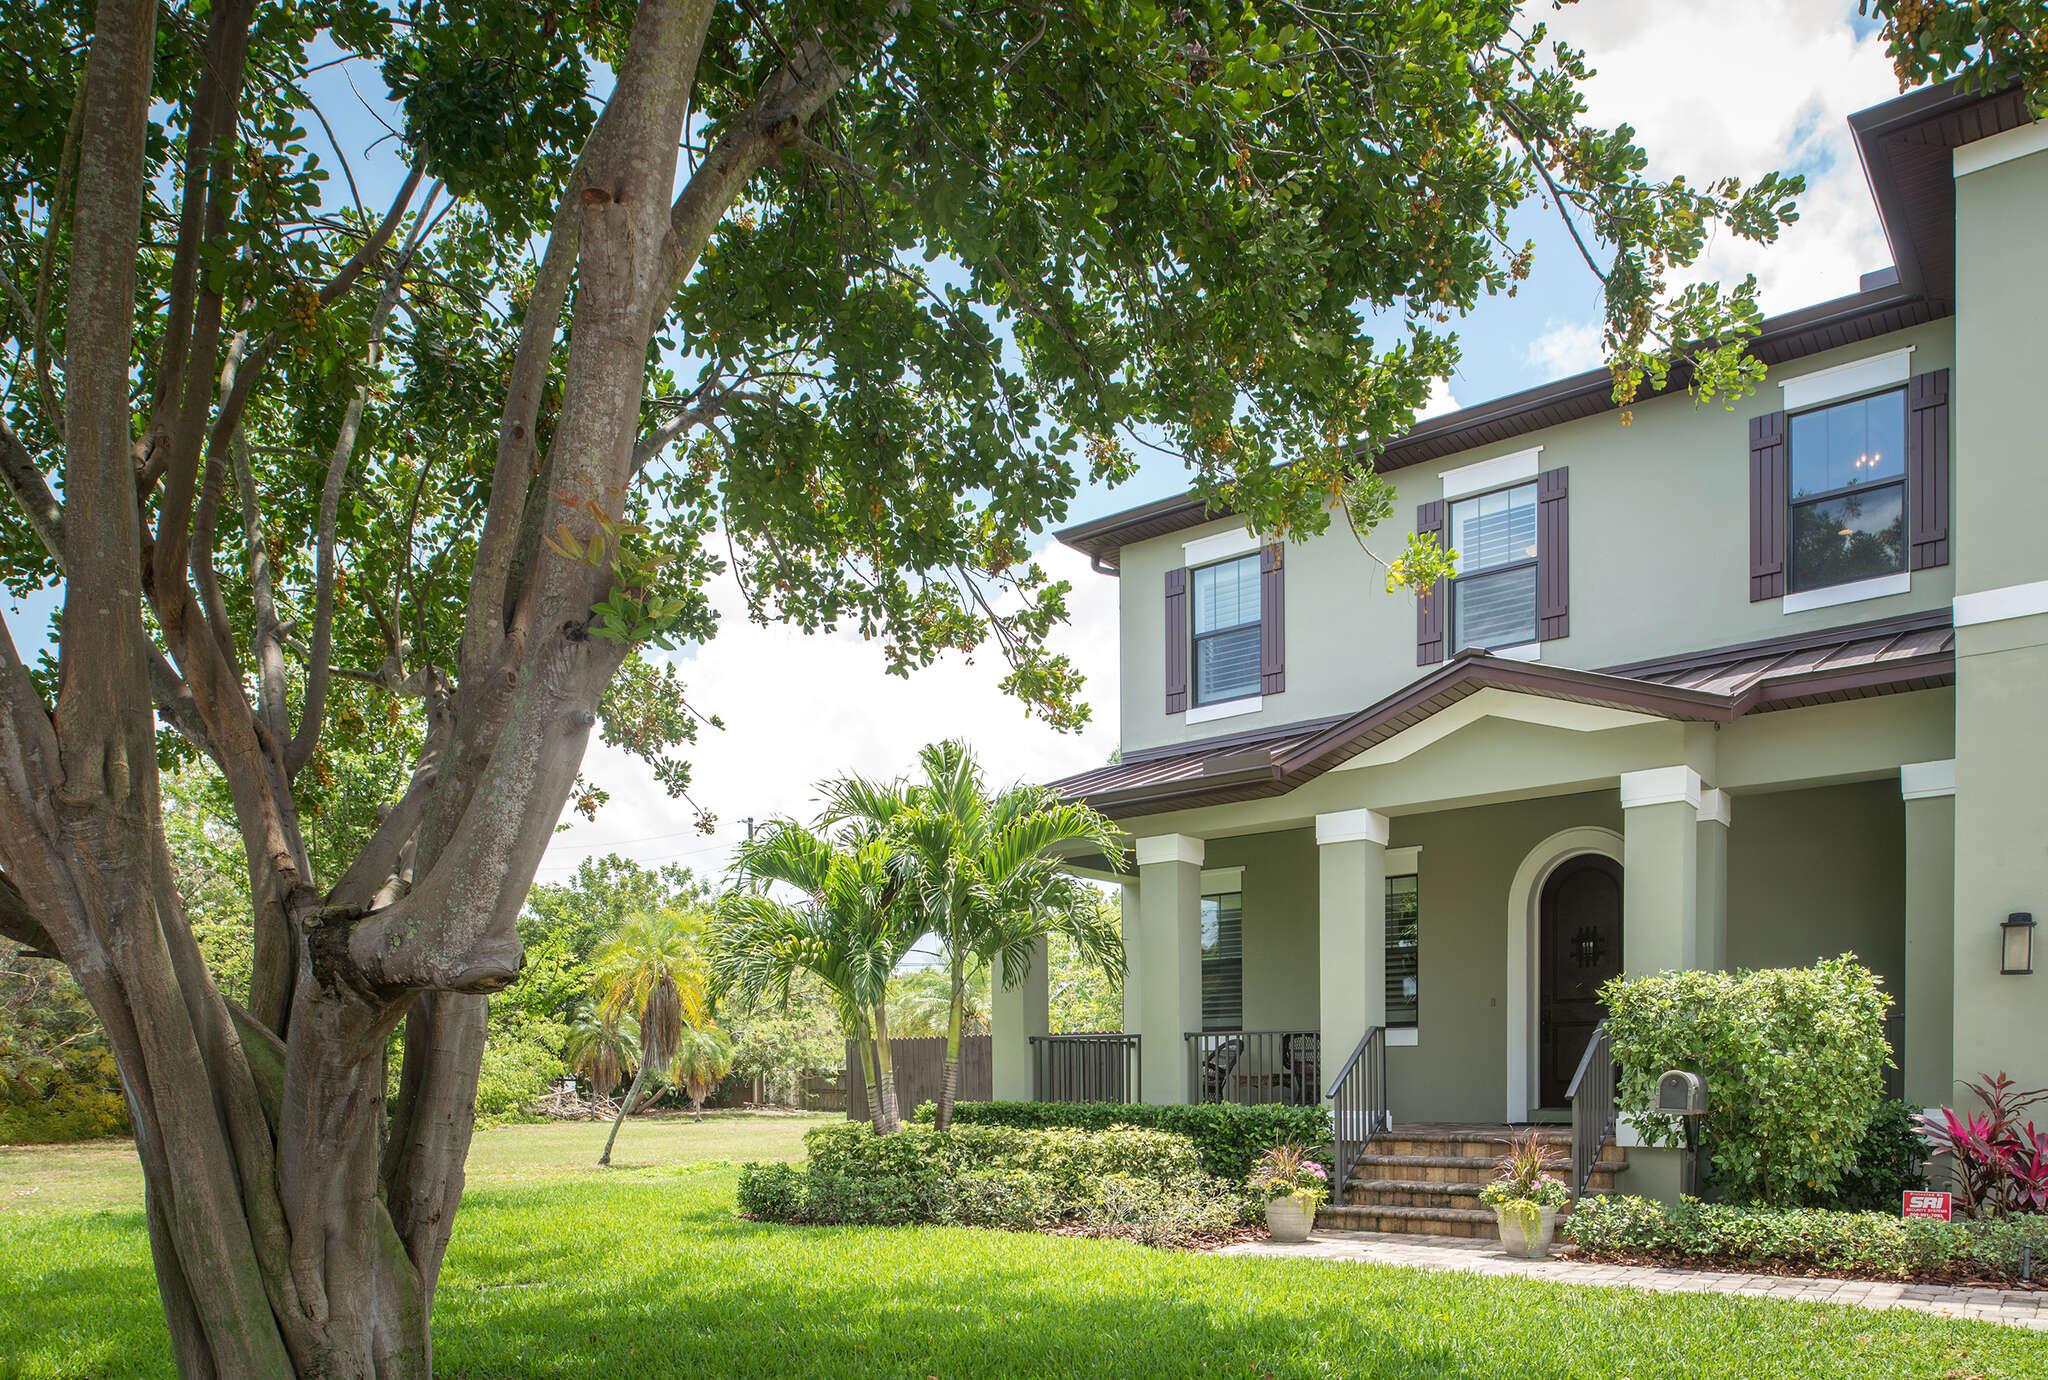 Single Family for Sale at 165 Ramon Way NE St. Petersburg, Florida 33704 United States